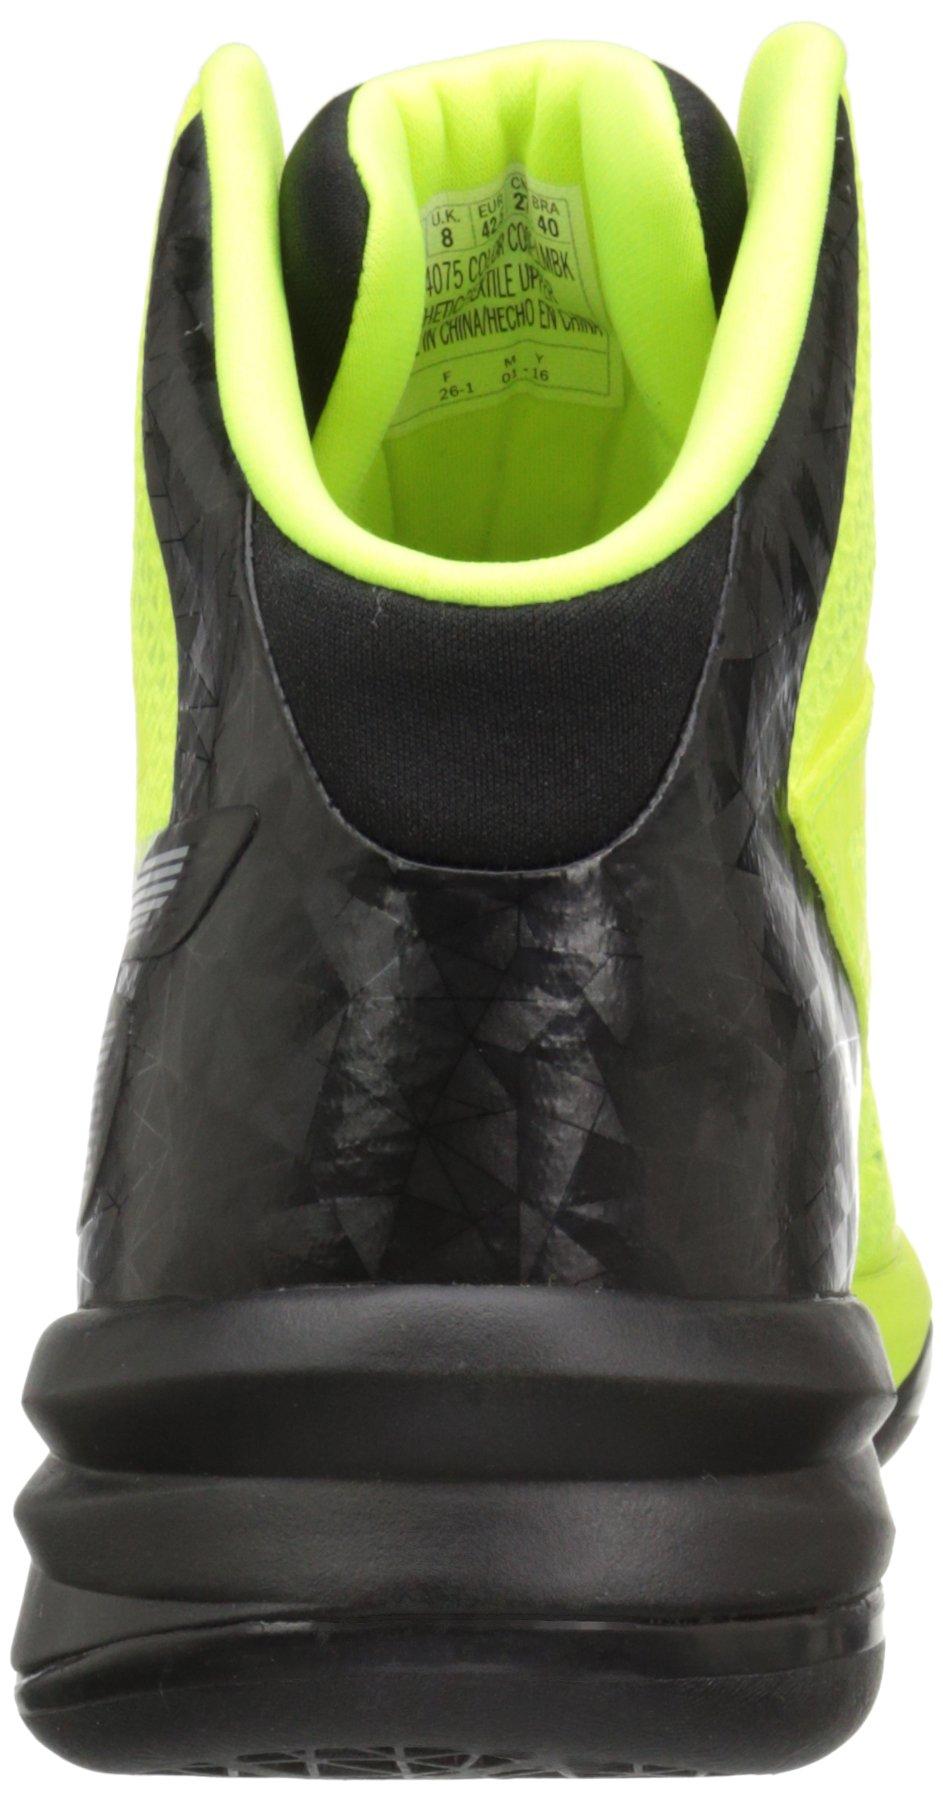 da29c779bbd8 Skechers Performance Men s Go Torch Basketball Shoe   Basketball ...